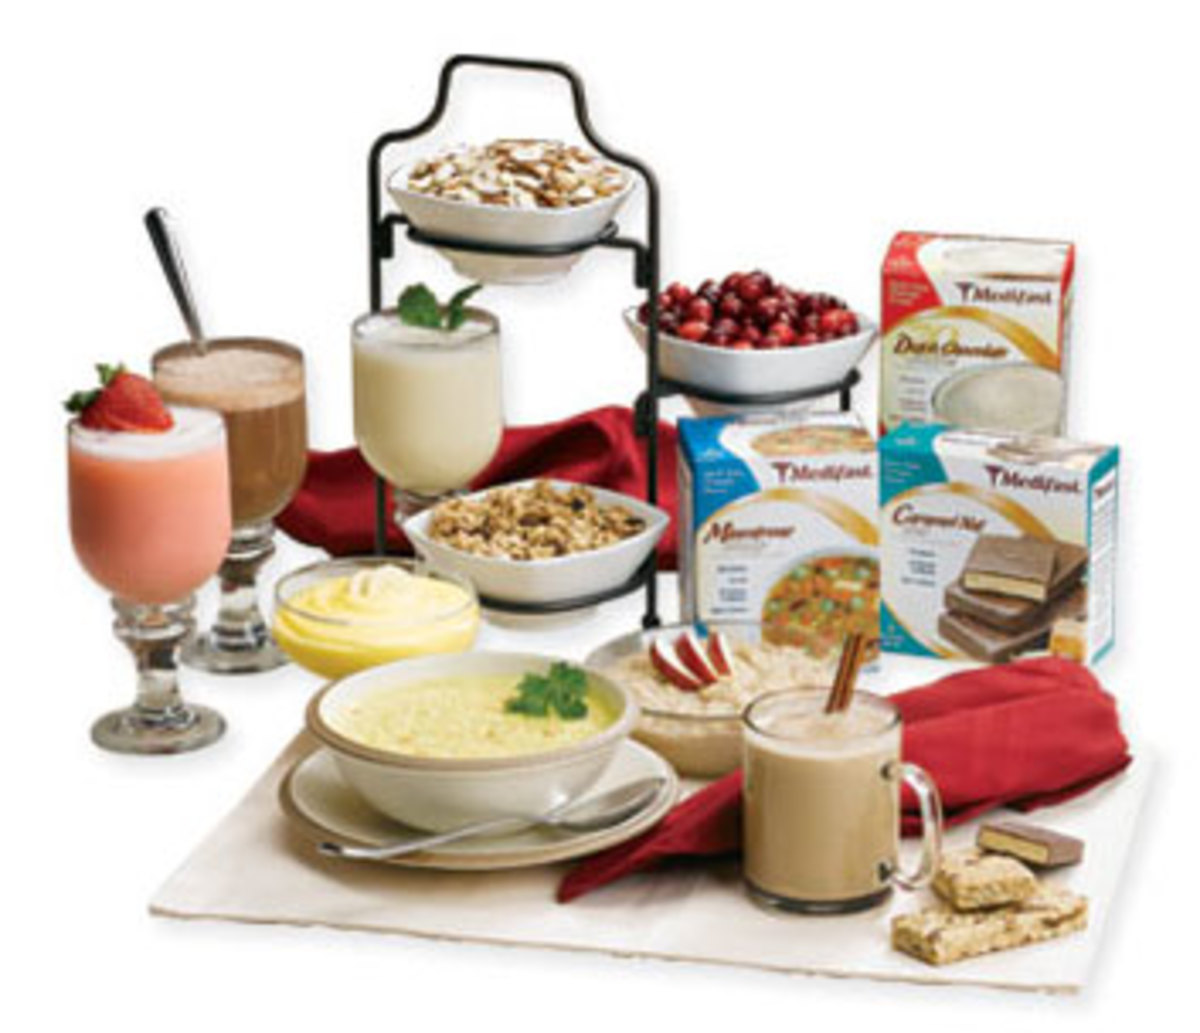 Medifast Foods